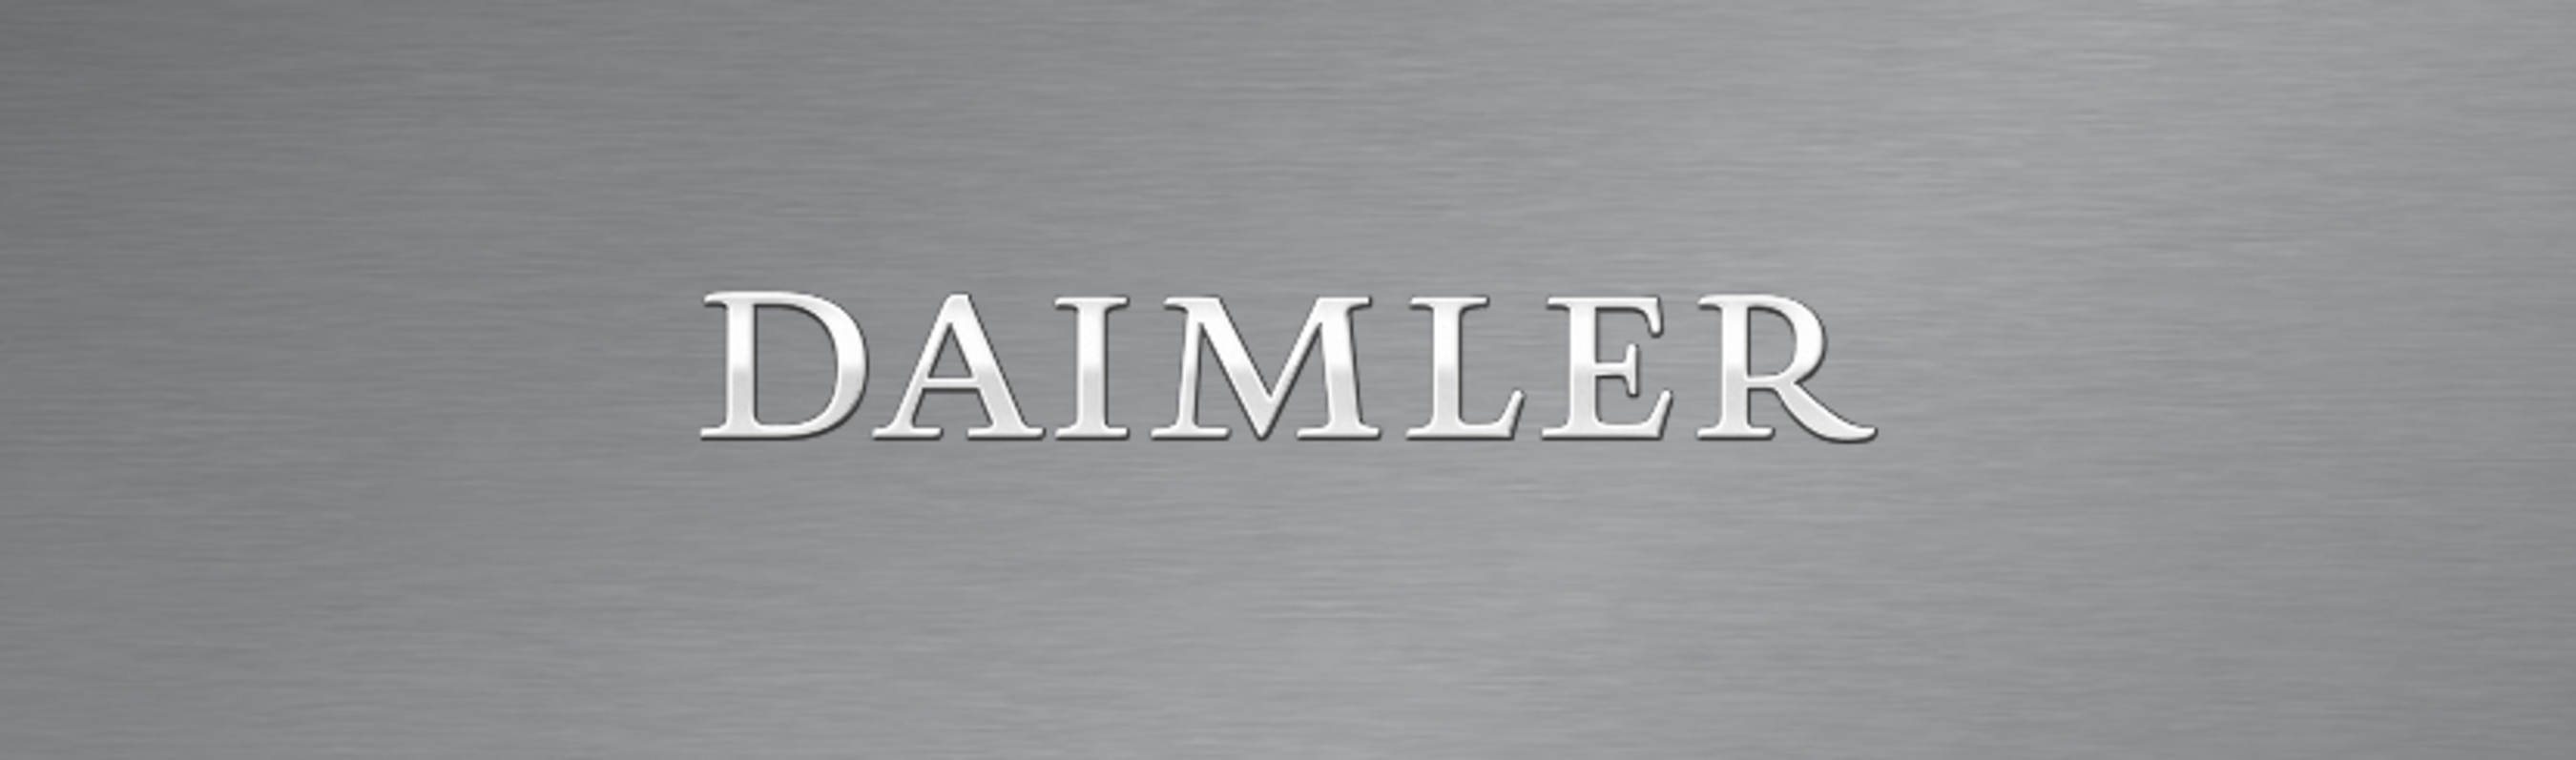 Daimler Logo (PRNewsFoto/Daimler Corporate Communications)